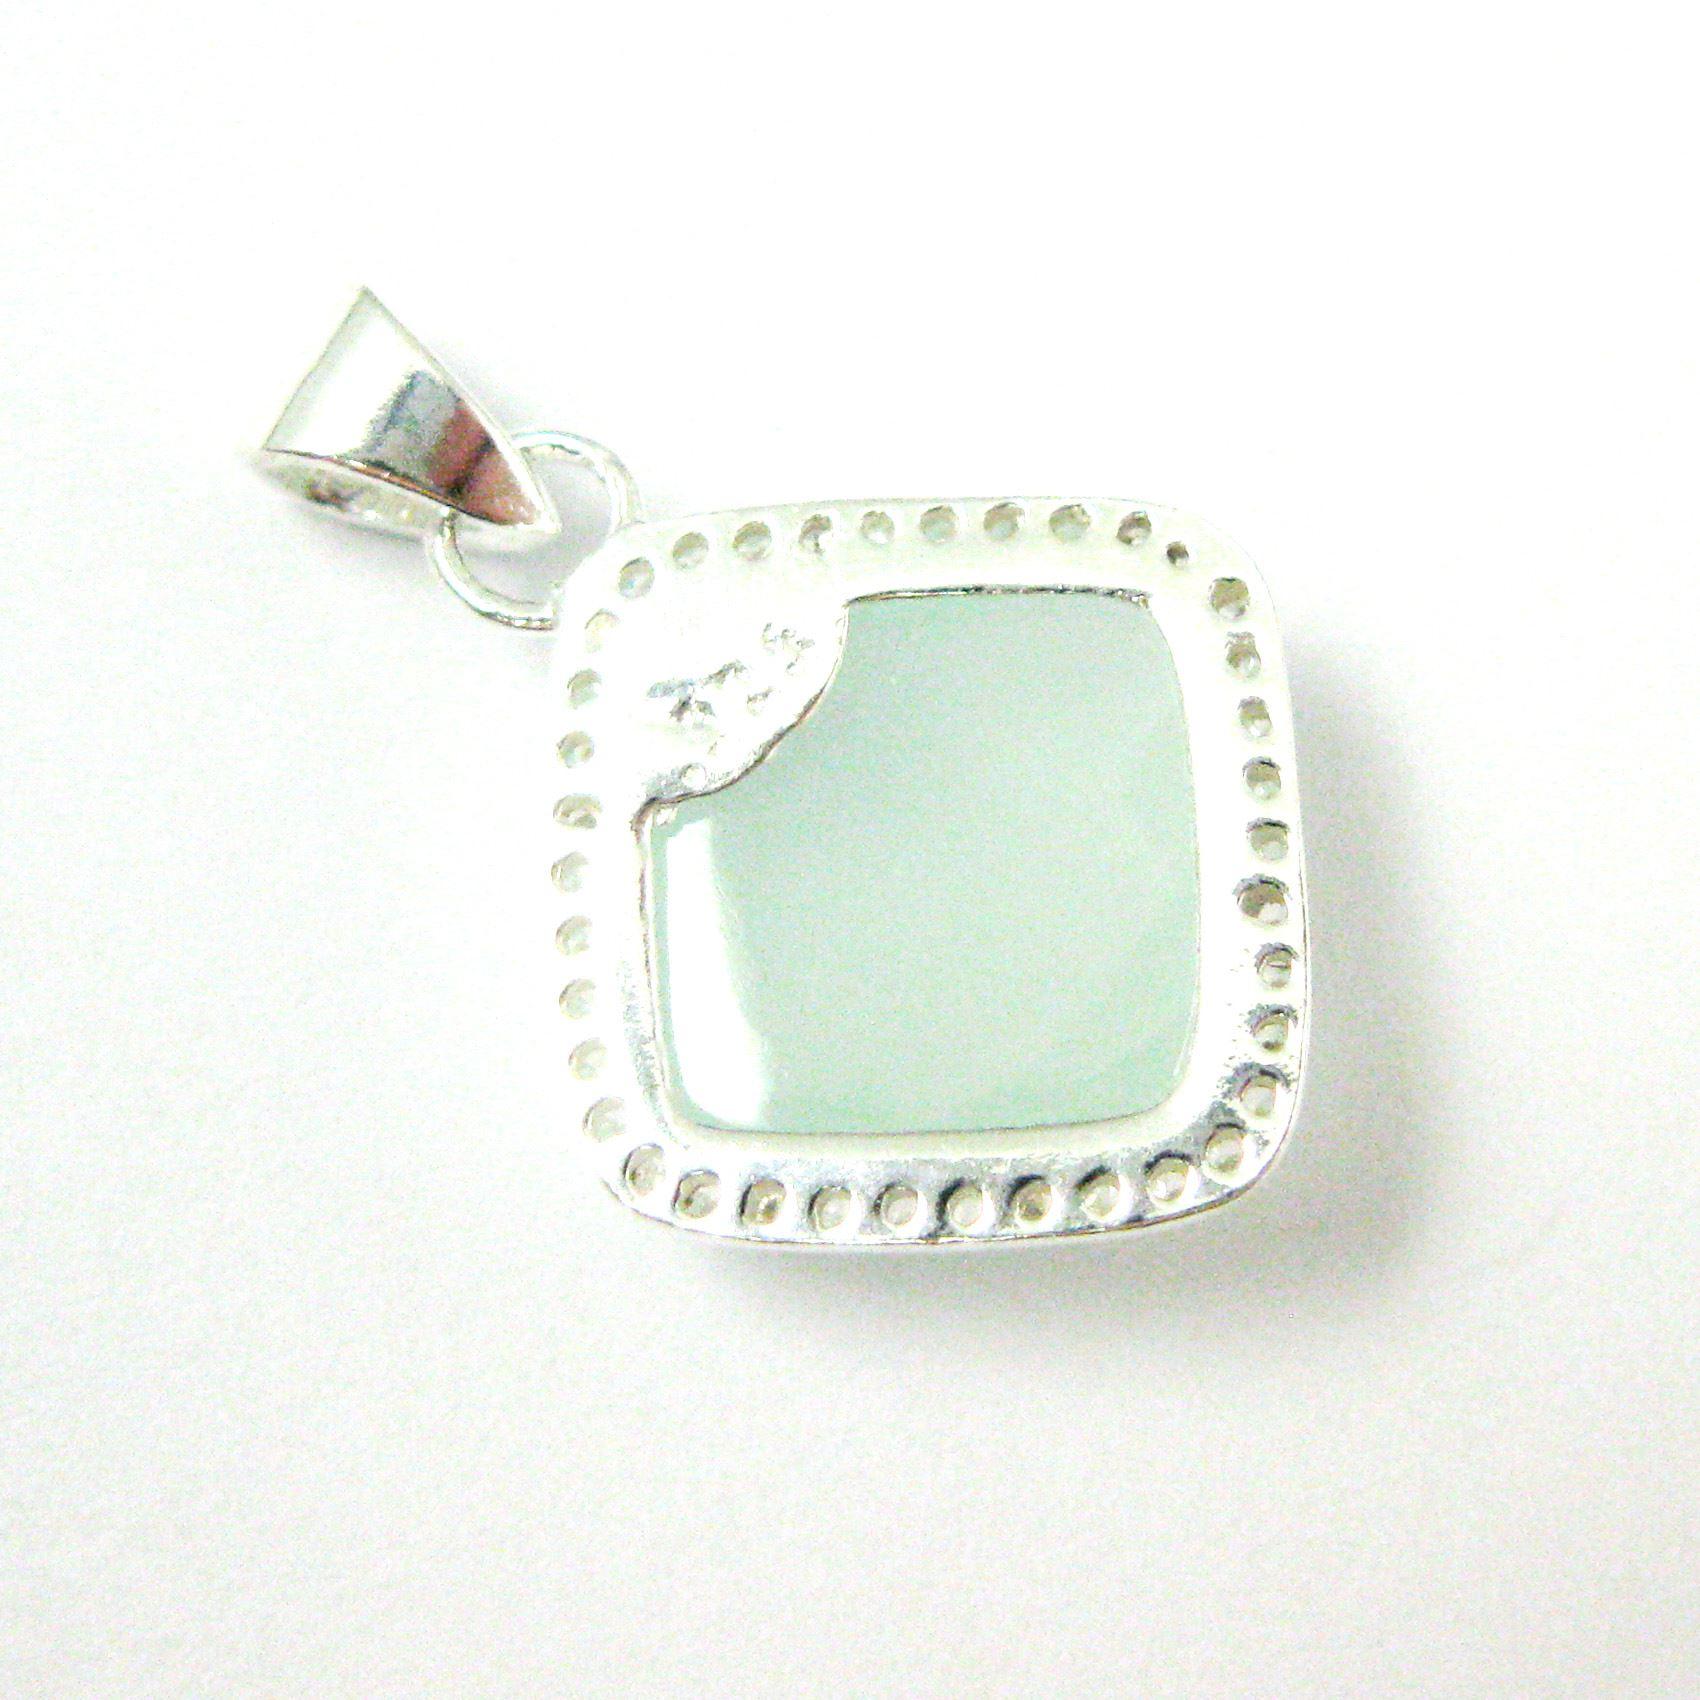 Sterling Silver Pave Bezel Gemstone Pendant - Cubic Zirconia Pave Setting -  Diamond Shape Faceted Stone-Aqua Chalcedony - 17mm